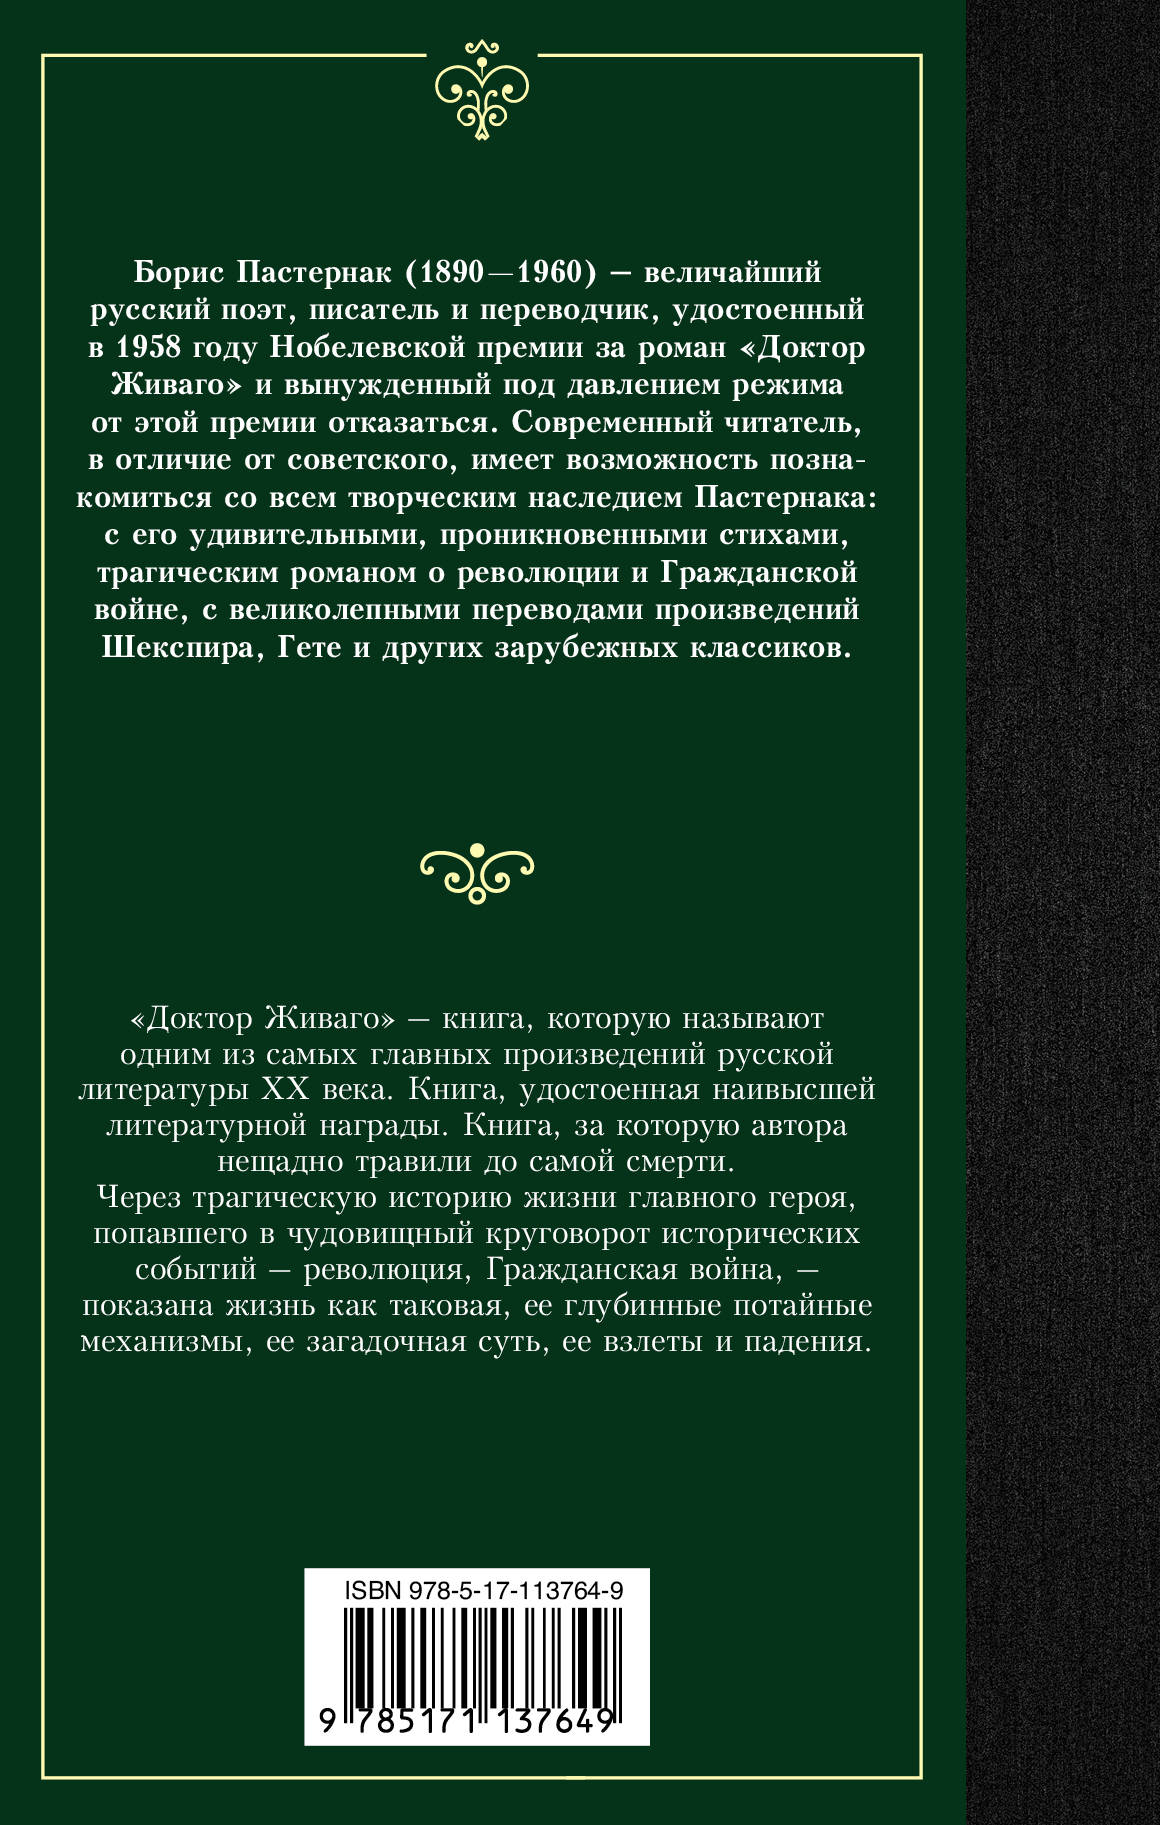 Б. Л. Пастернак. Доктор Живаго